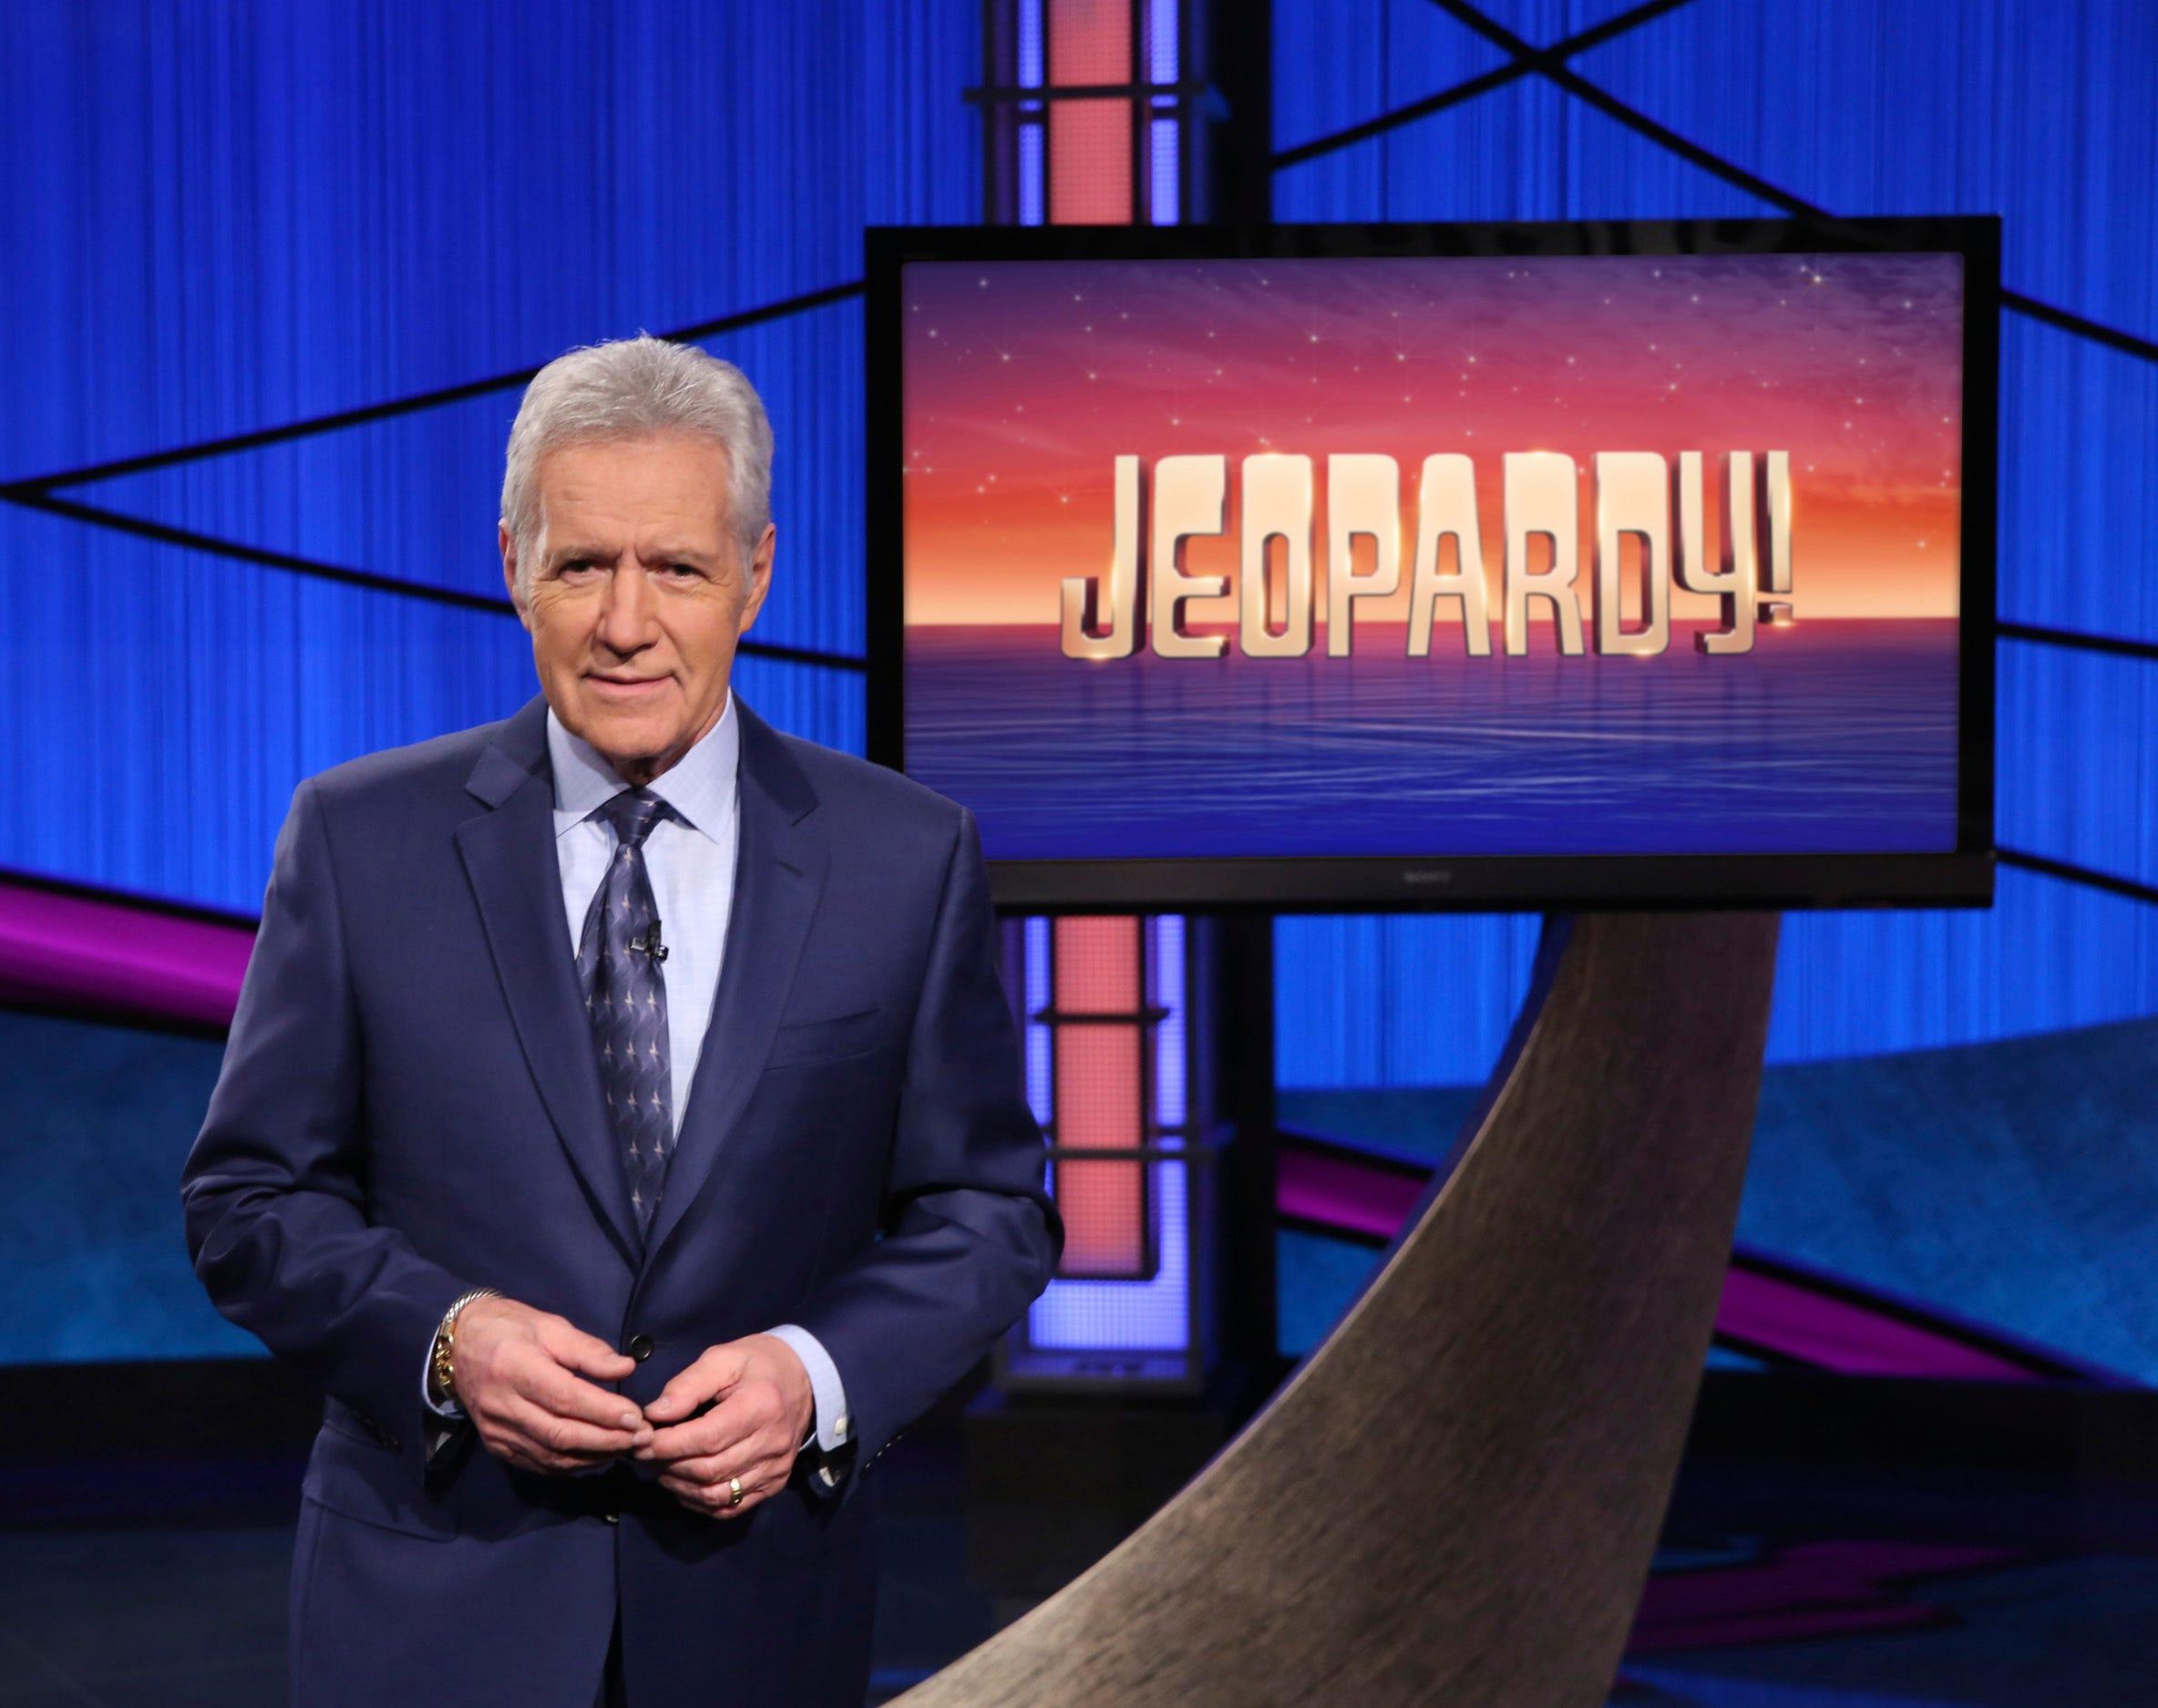 'Jeopardy!' host Alex Trebek announces Ottawa Senators' selection in 2020 NHL draft